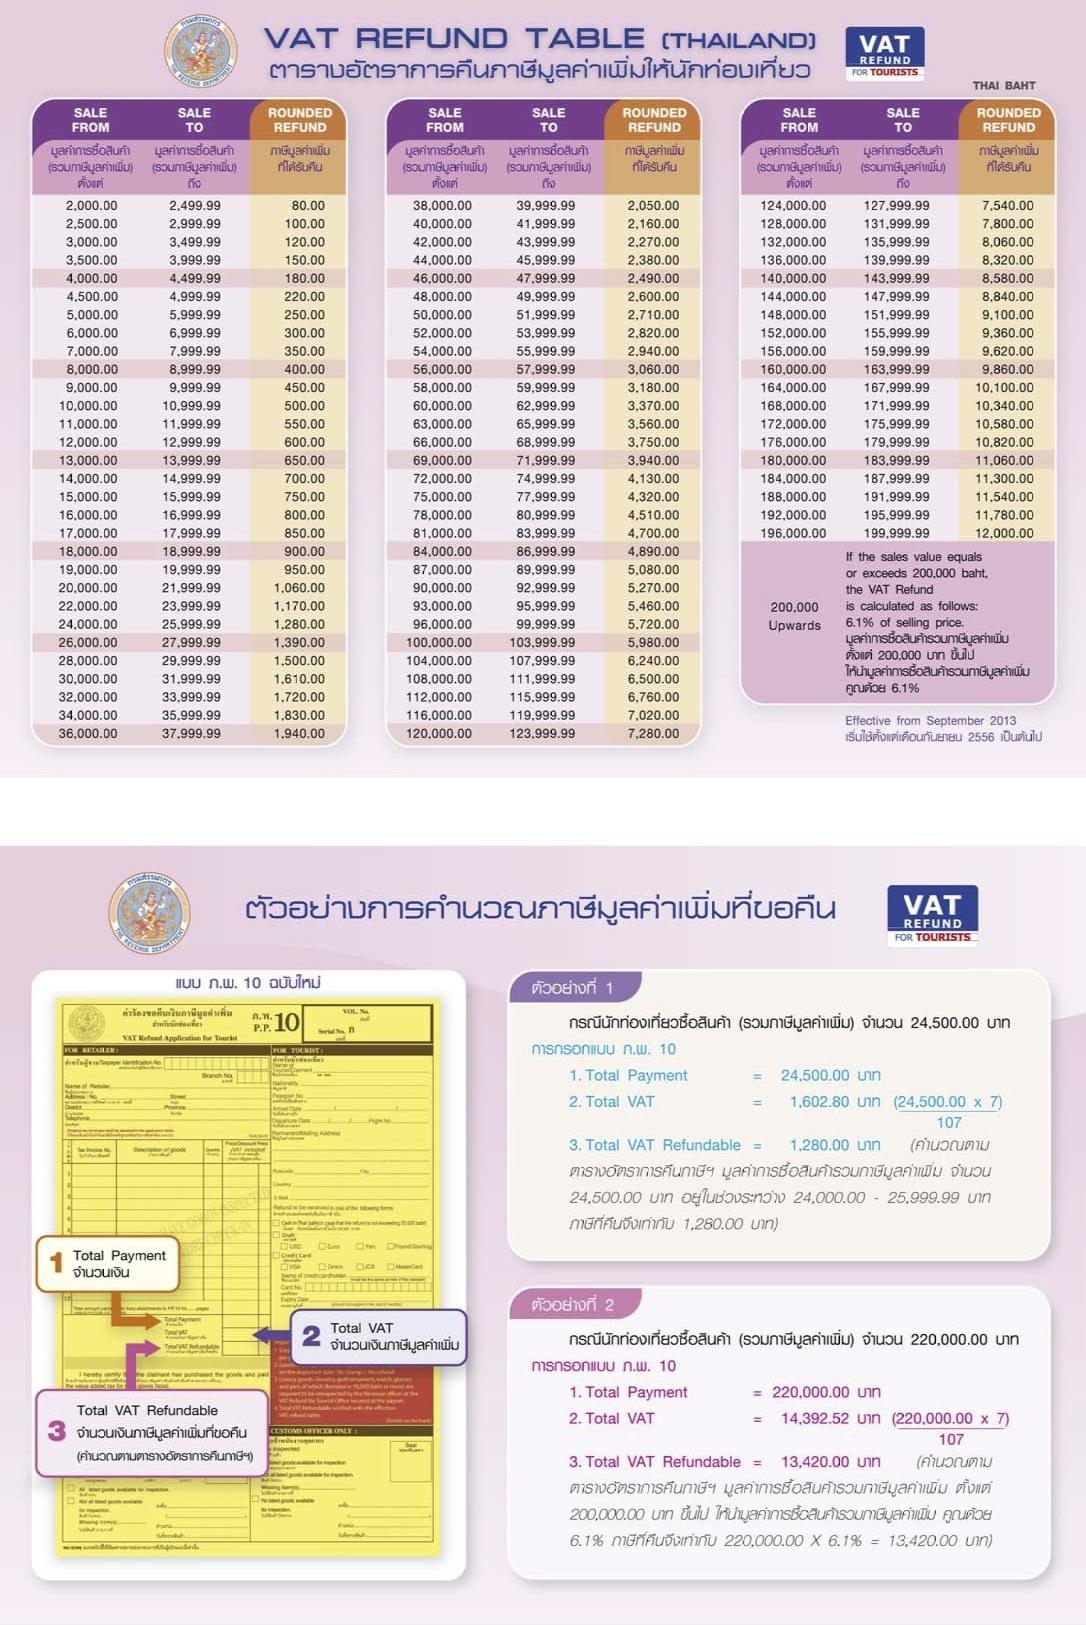 VAT泰國三步驟簡單辦理購物退稅Refund For Tourists退稅金額表.jpg